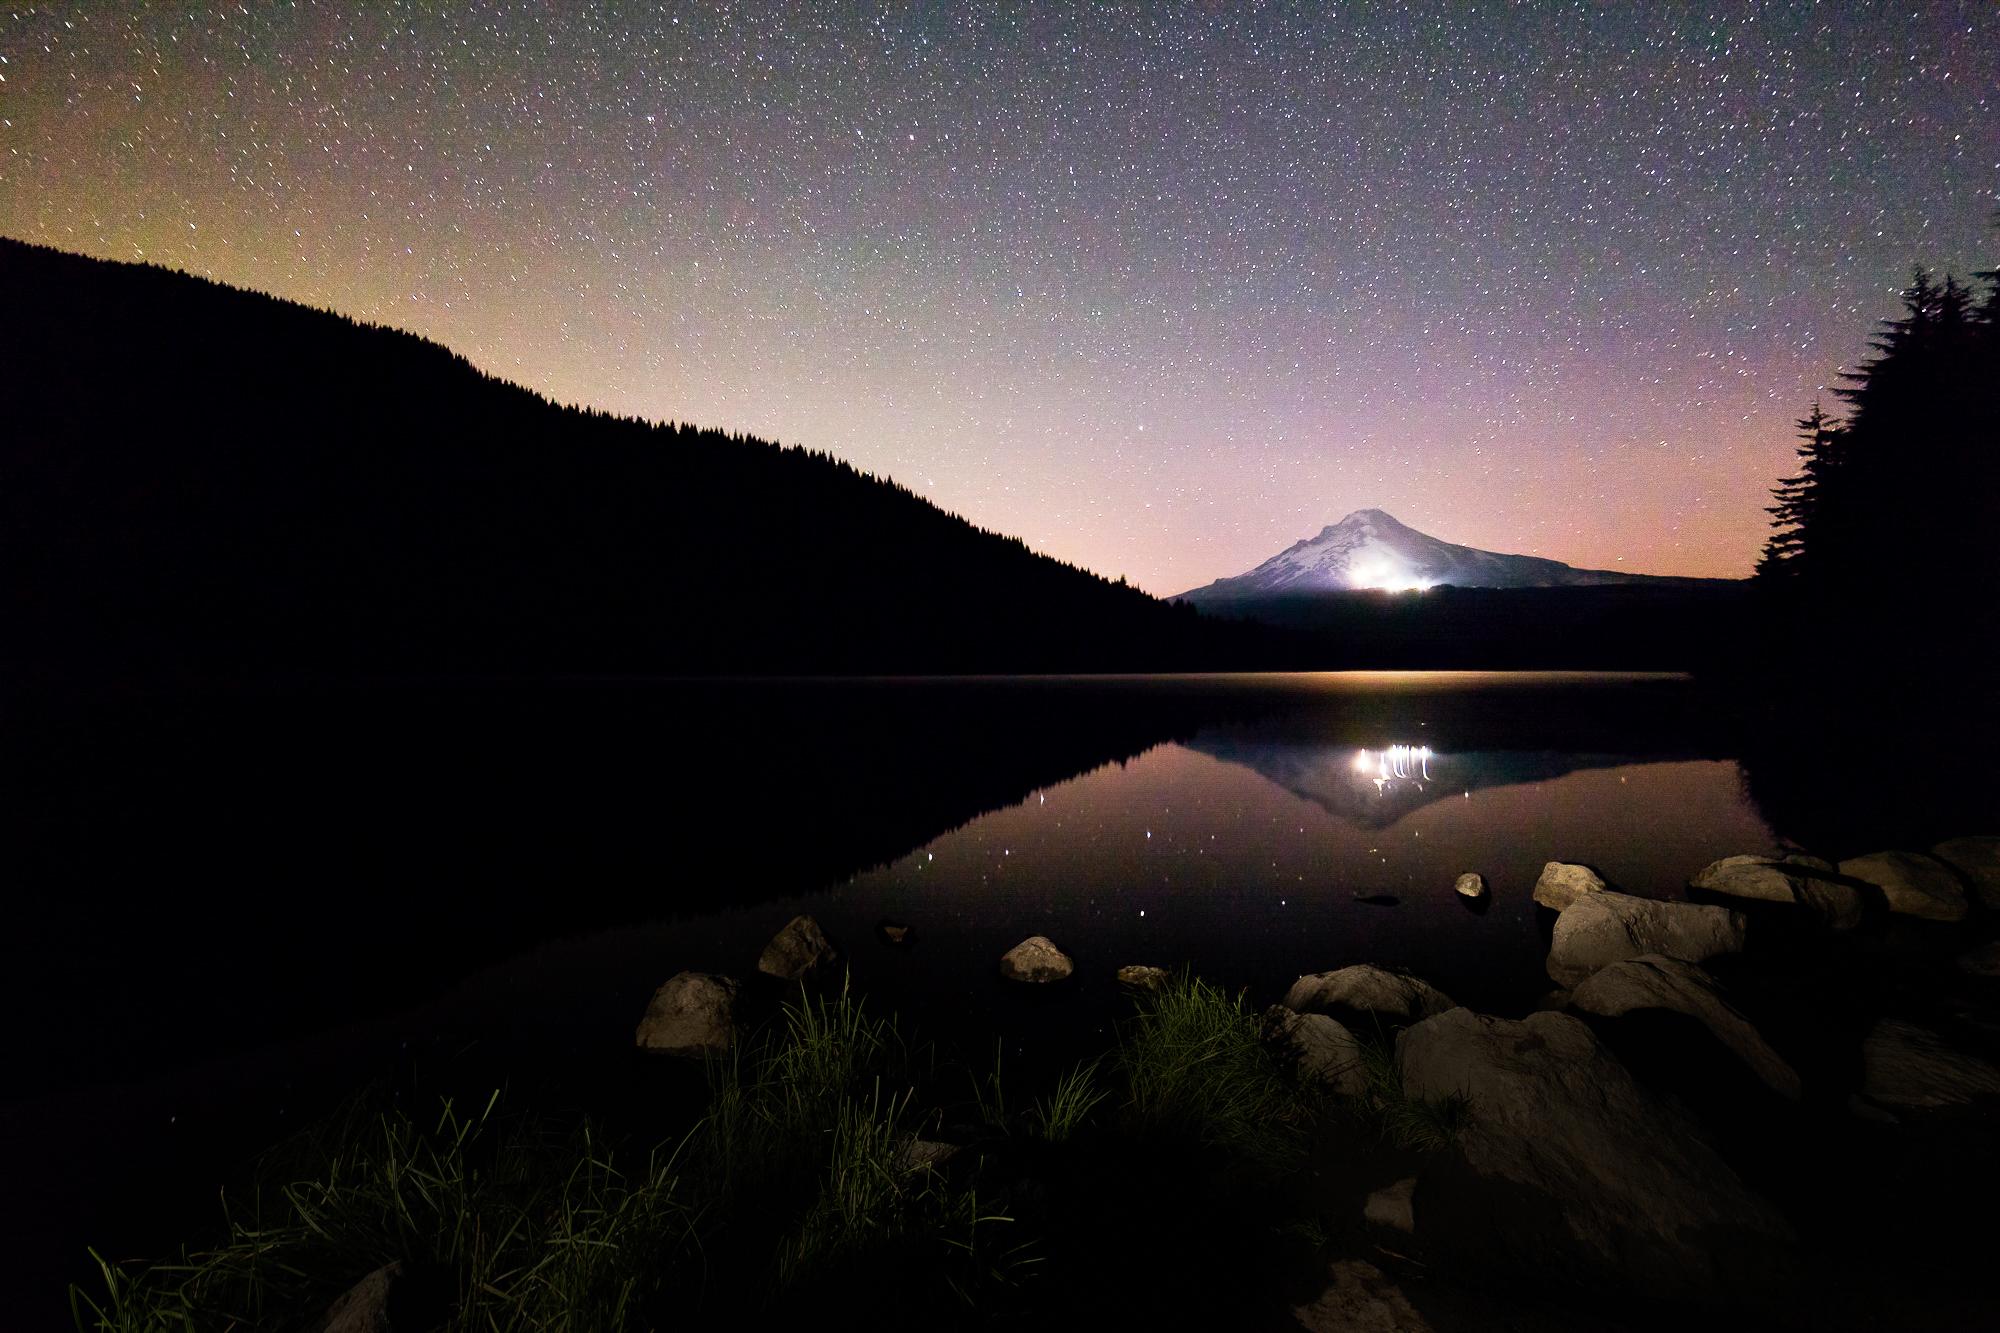 089Travel_Adventure_Outdoor_Photography_Outlive_Creative_Oregon_Trillium_Lake.jpg